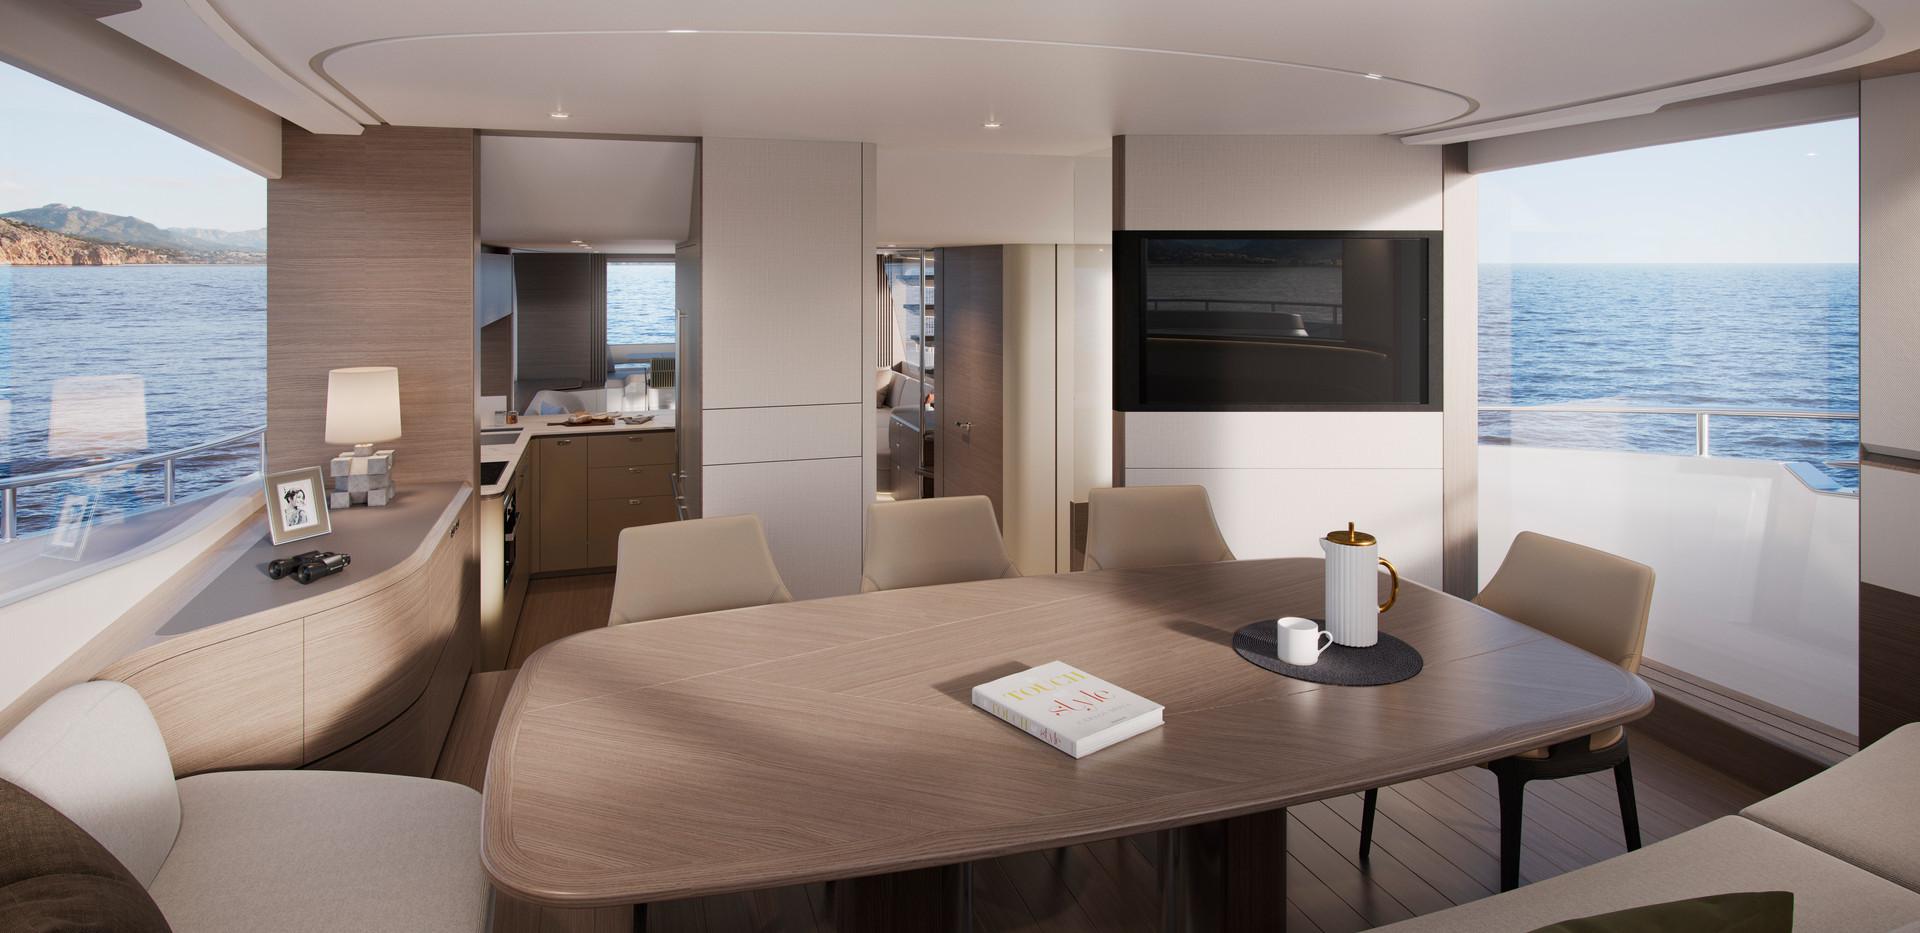 x80-interior-fwd-dining-area-cgi.jpg